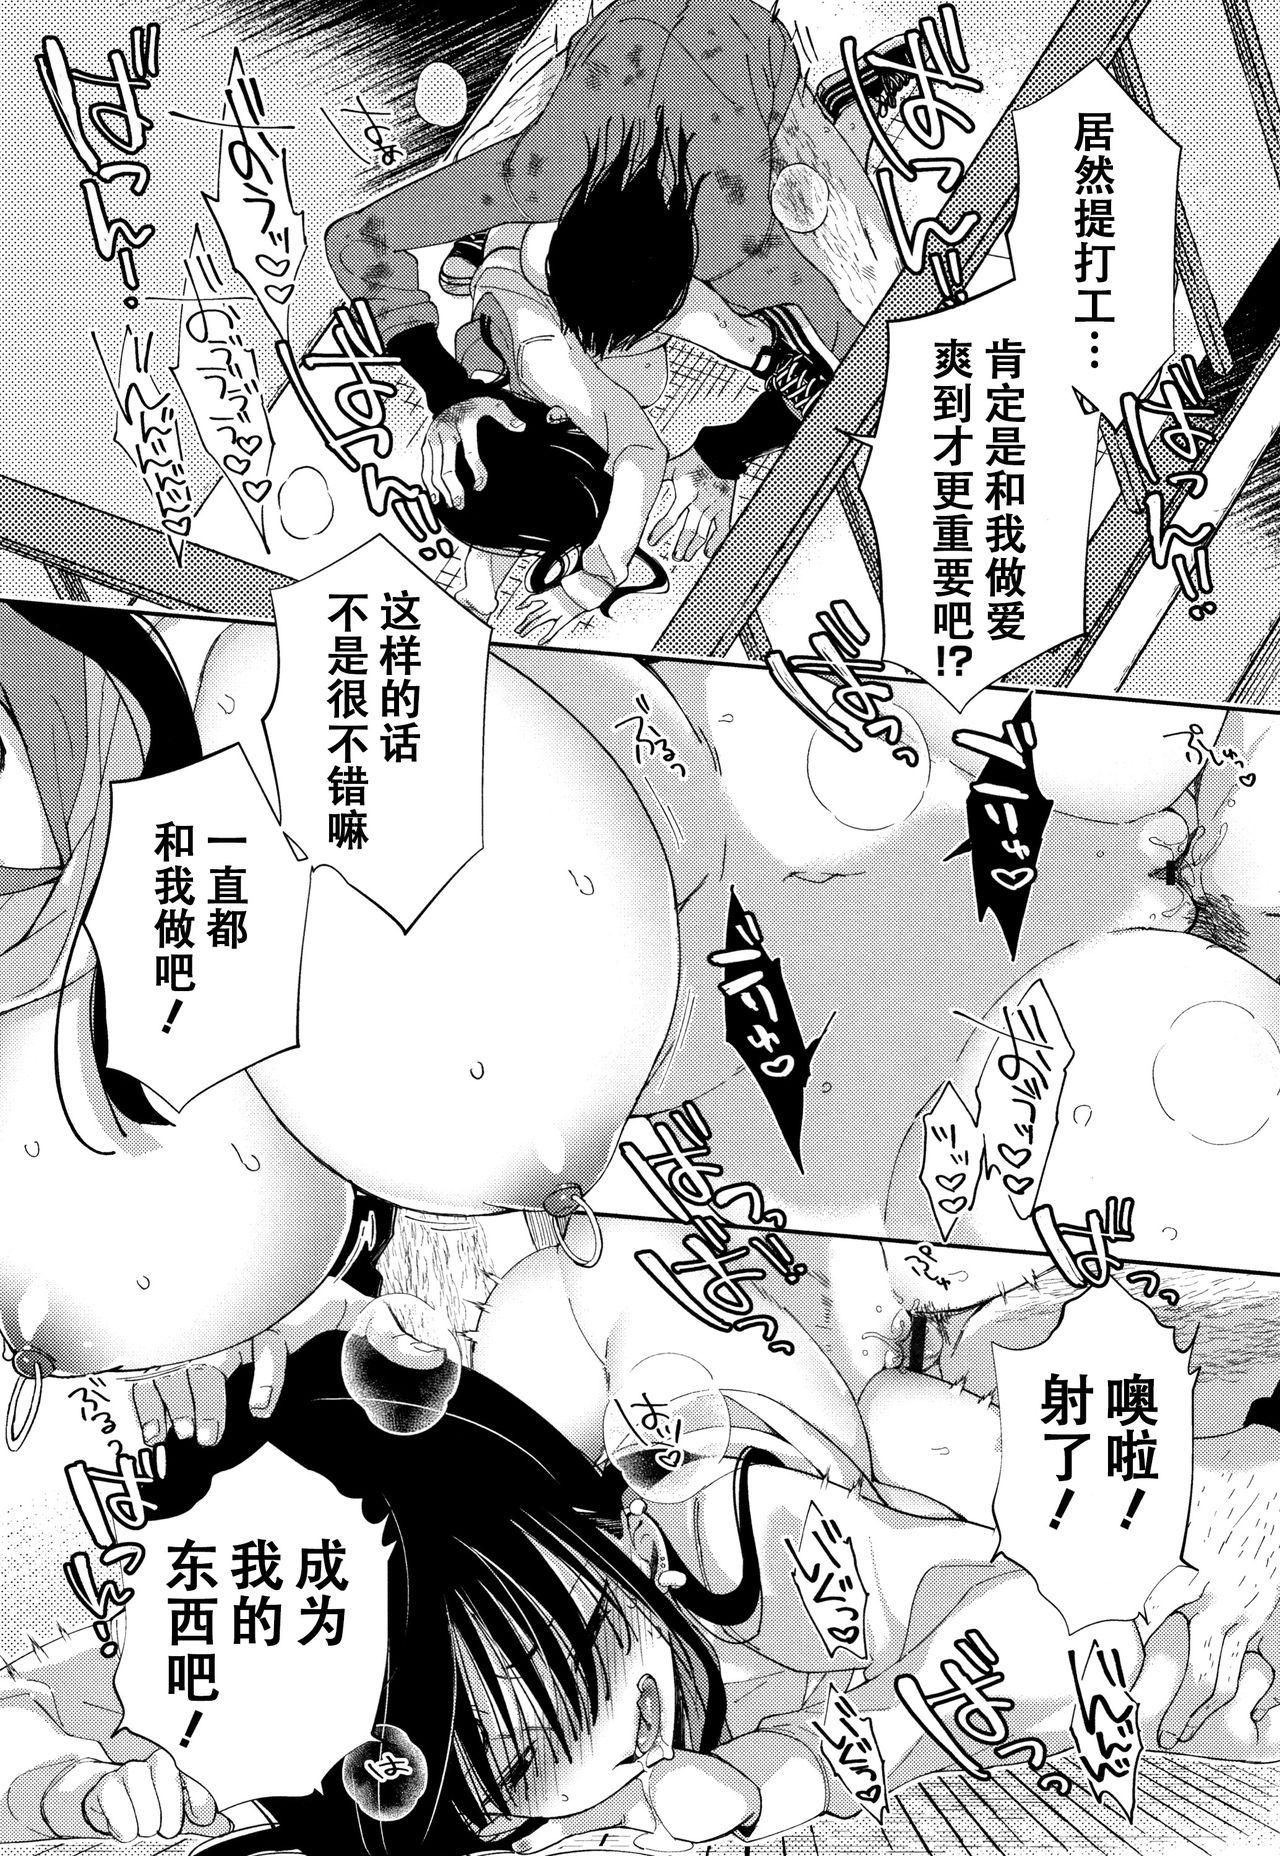 [Achumuchi] Saijaku Gal wa Ikizurai! - The weakest pussy is hard to go.ch.1-8 [Chinese] [战栗的玻璃棒汉化] [Ongoing] 74